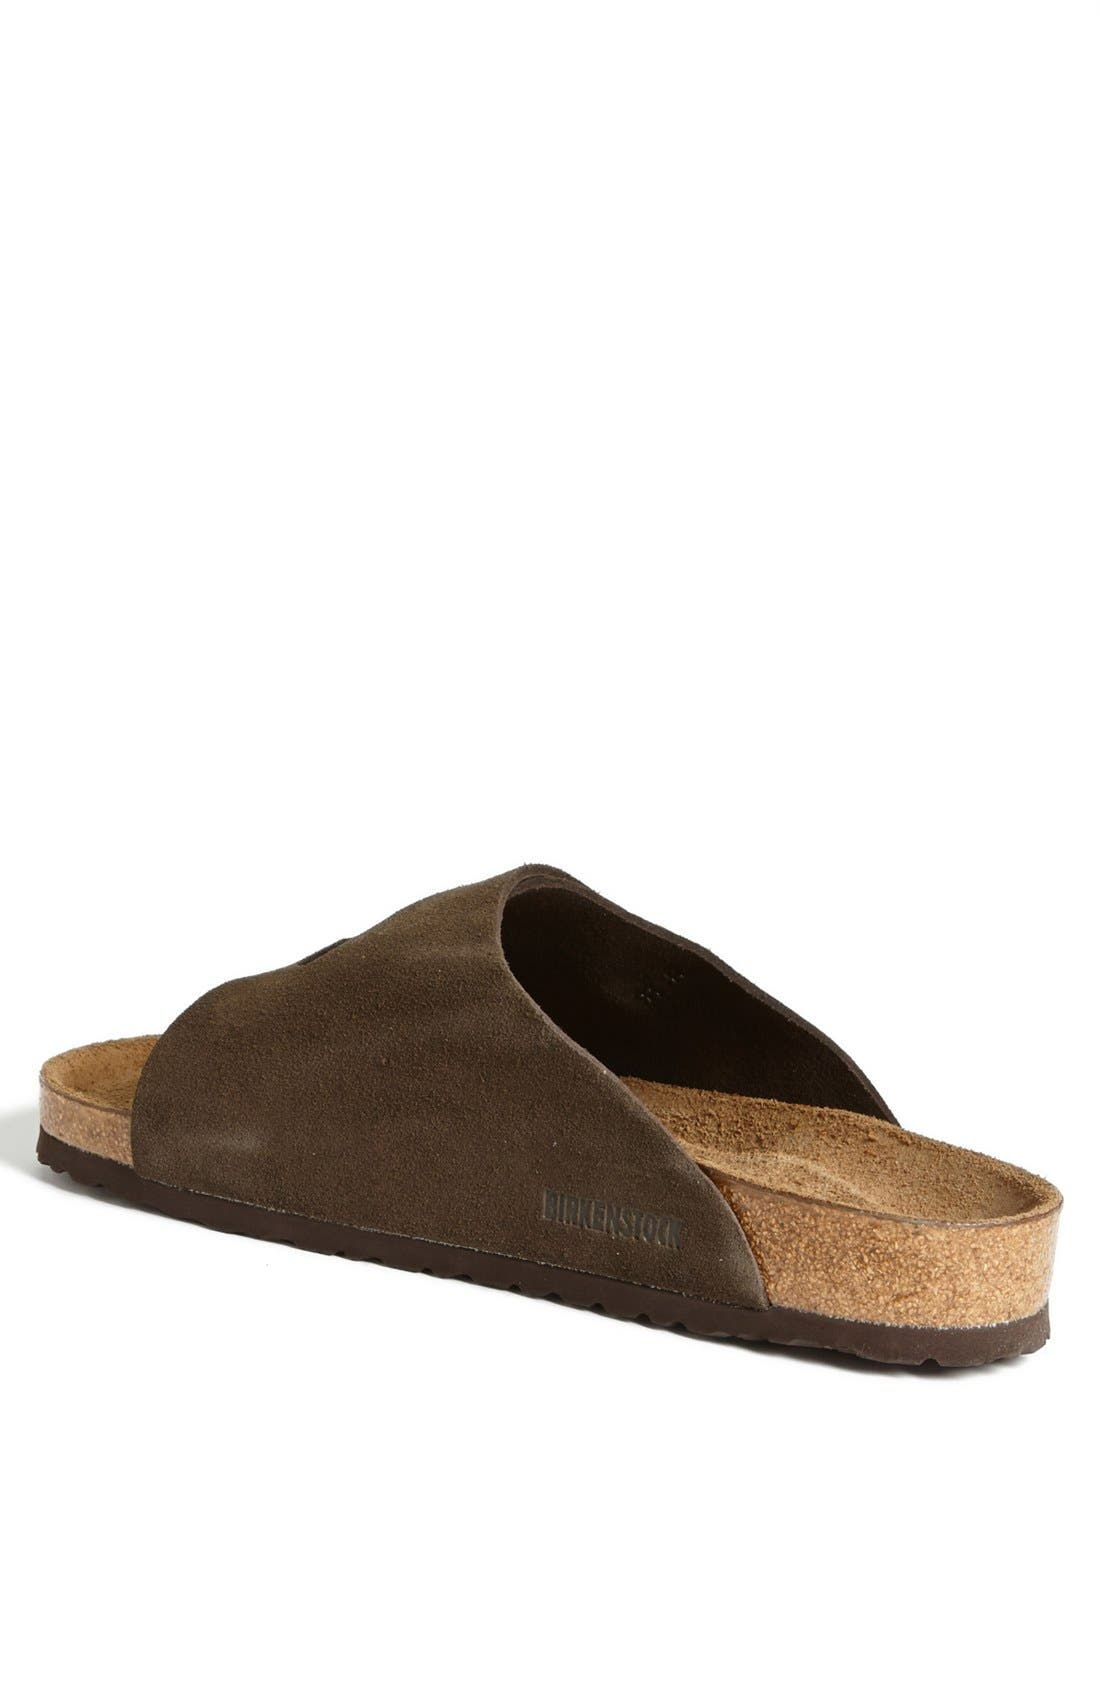 Alternate Image 2  - Birkenstock 'Zürich Soft' Sandal (Men)